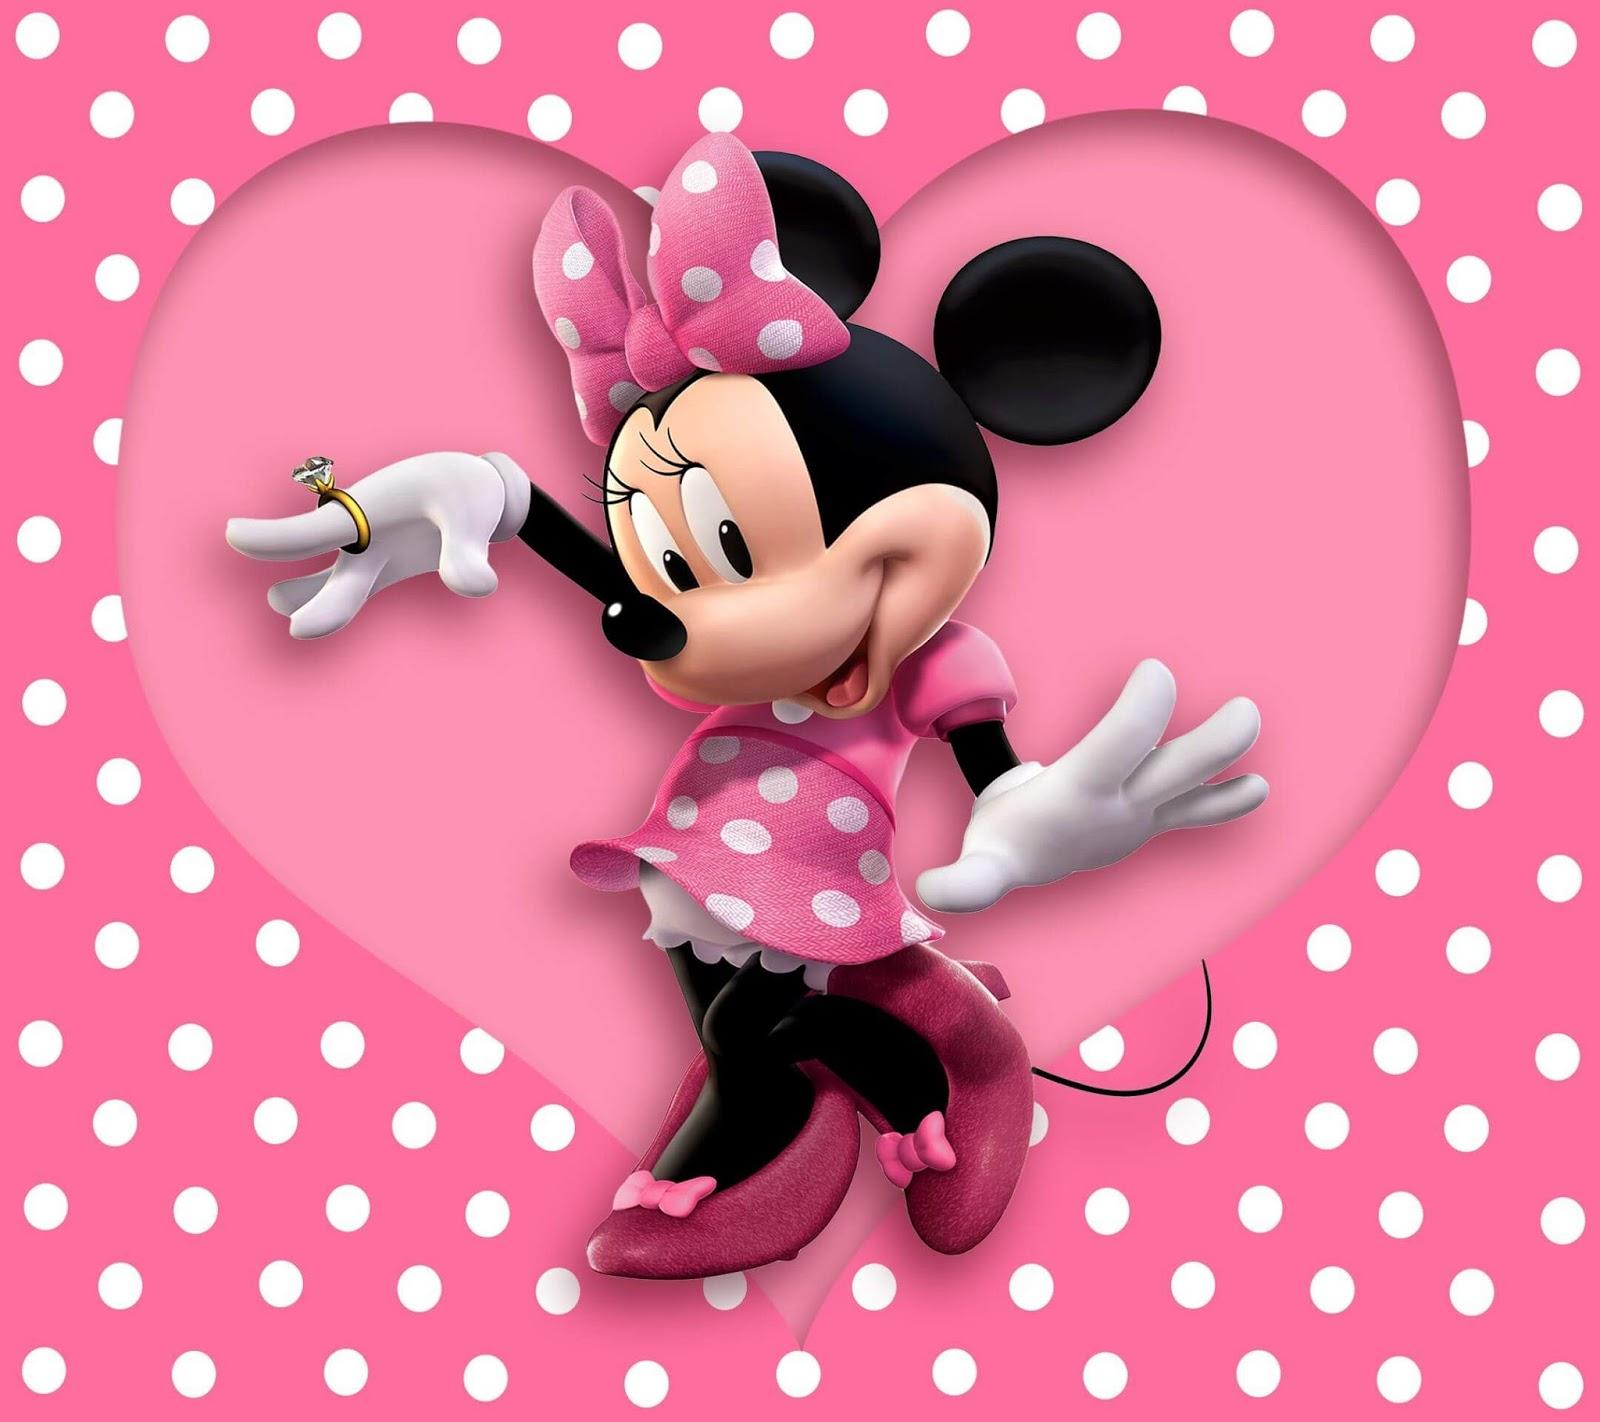 Ultra HD 4K Minnie Mouse Wallpaper Download